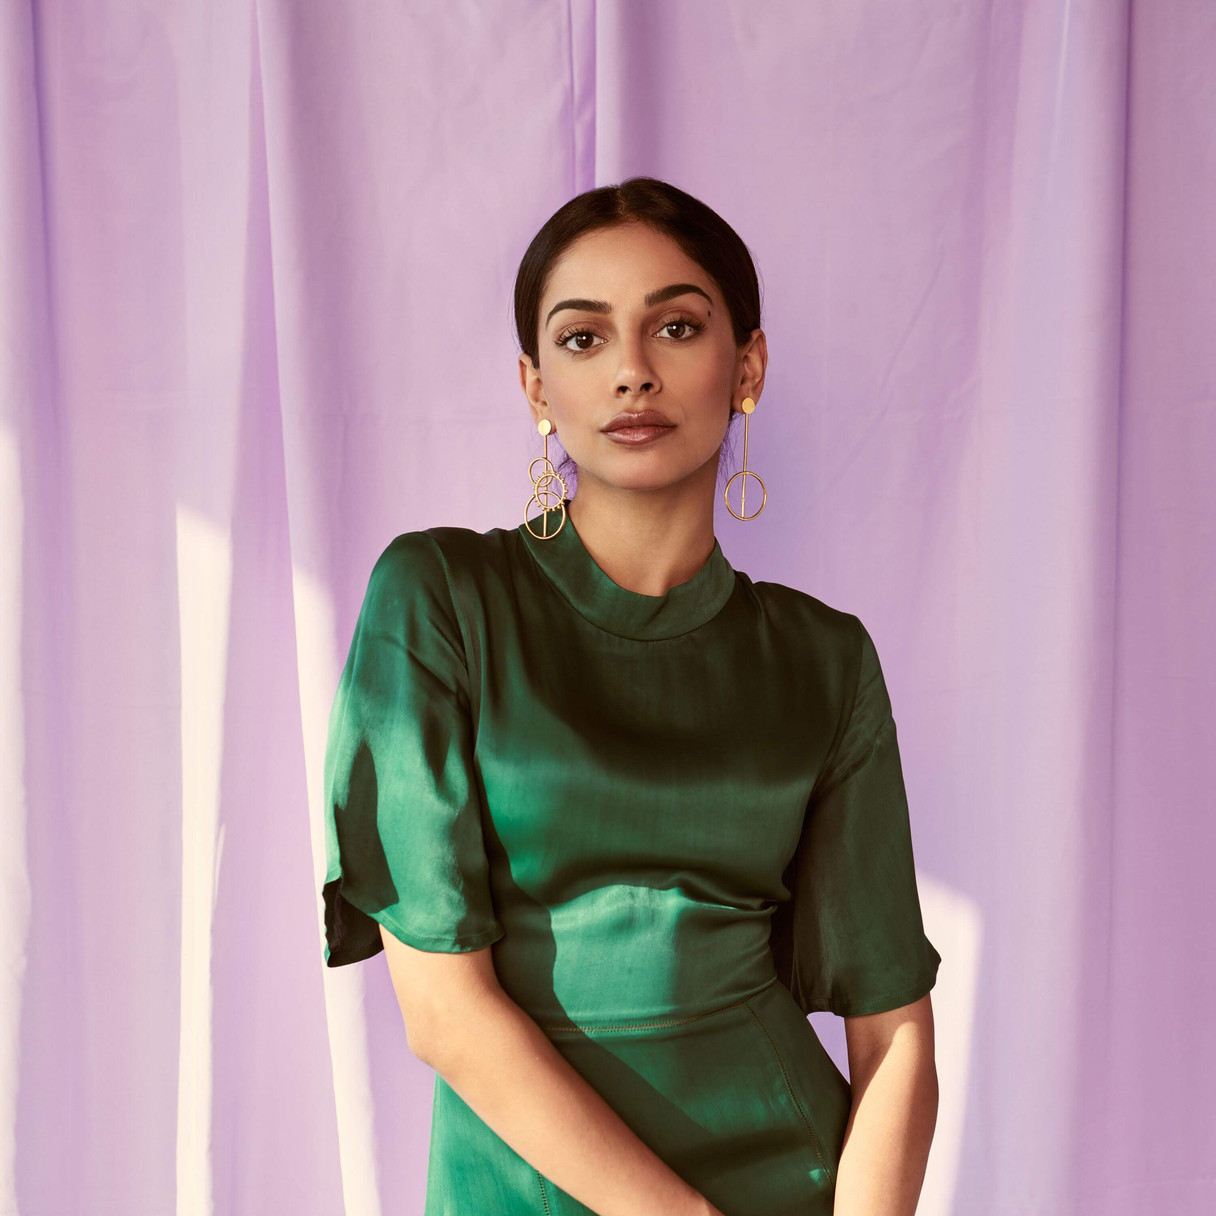 Banita Sandhu for a shoot in Mumbai Styled by - Meagan Concessio